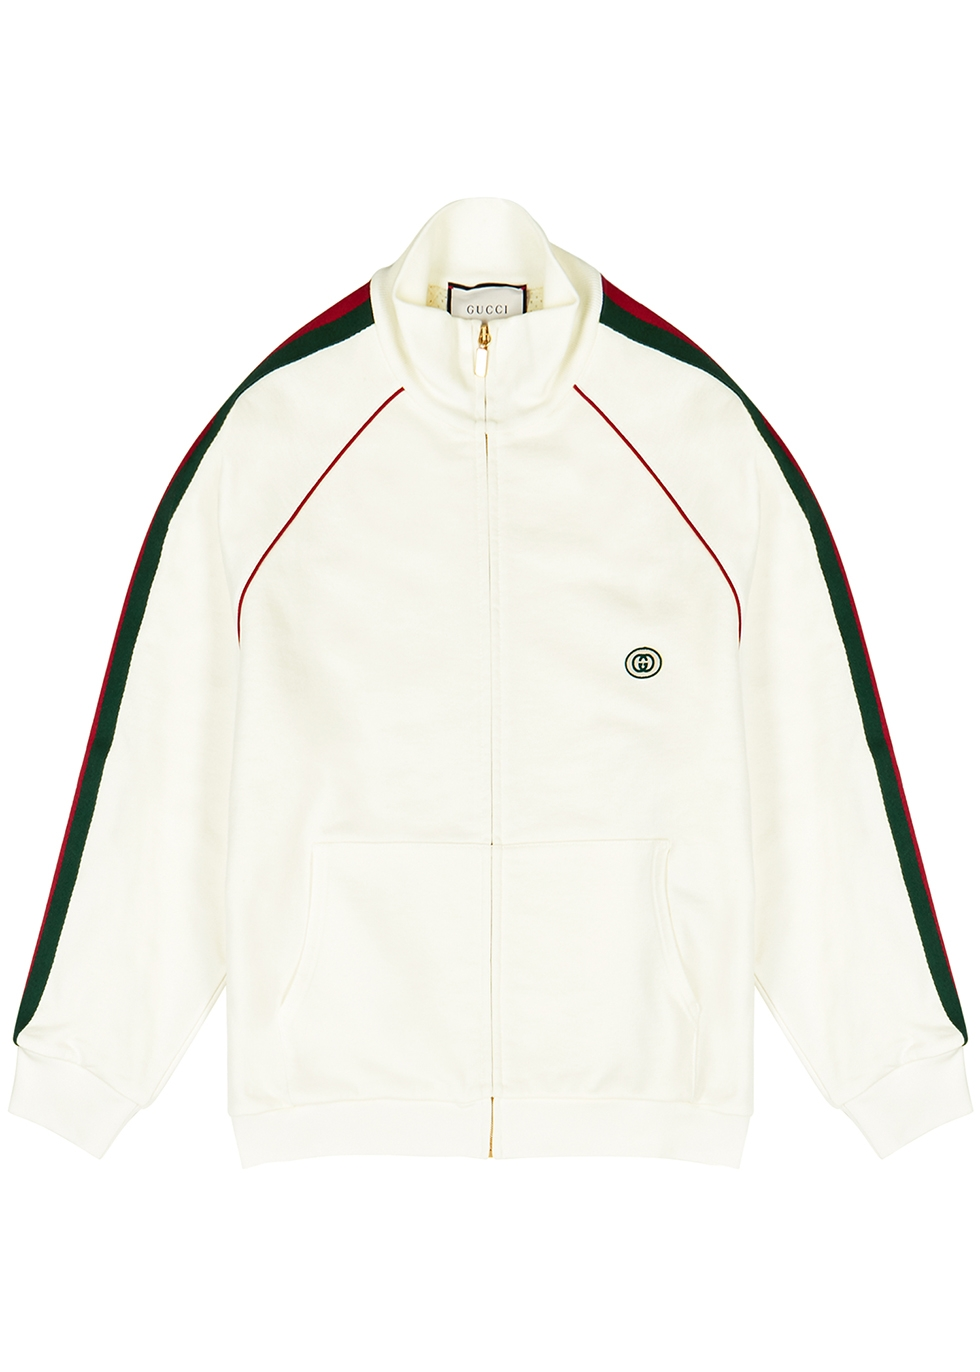 White cotton track jacket